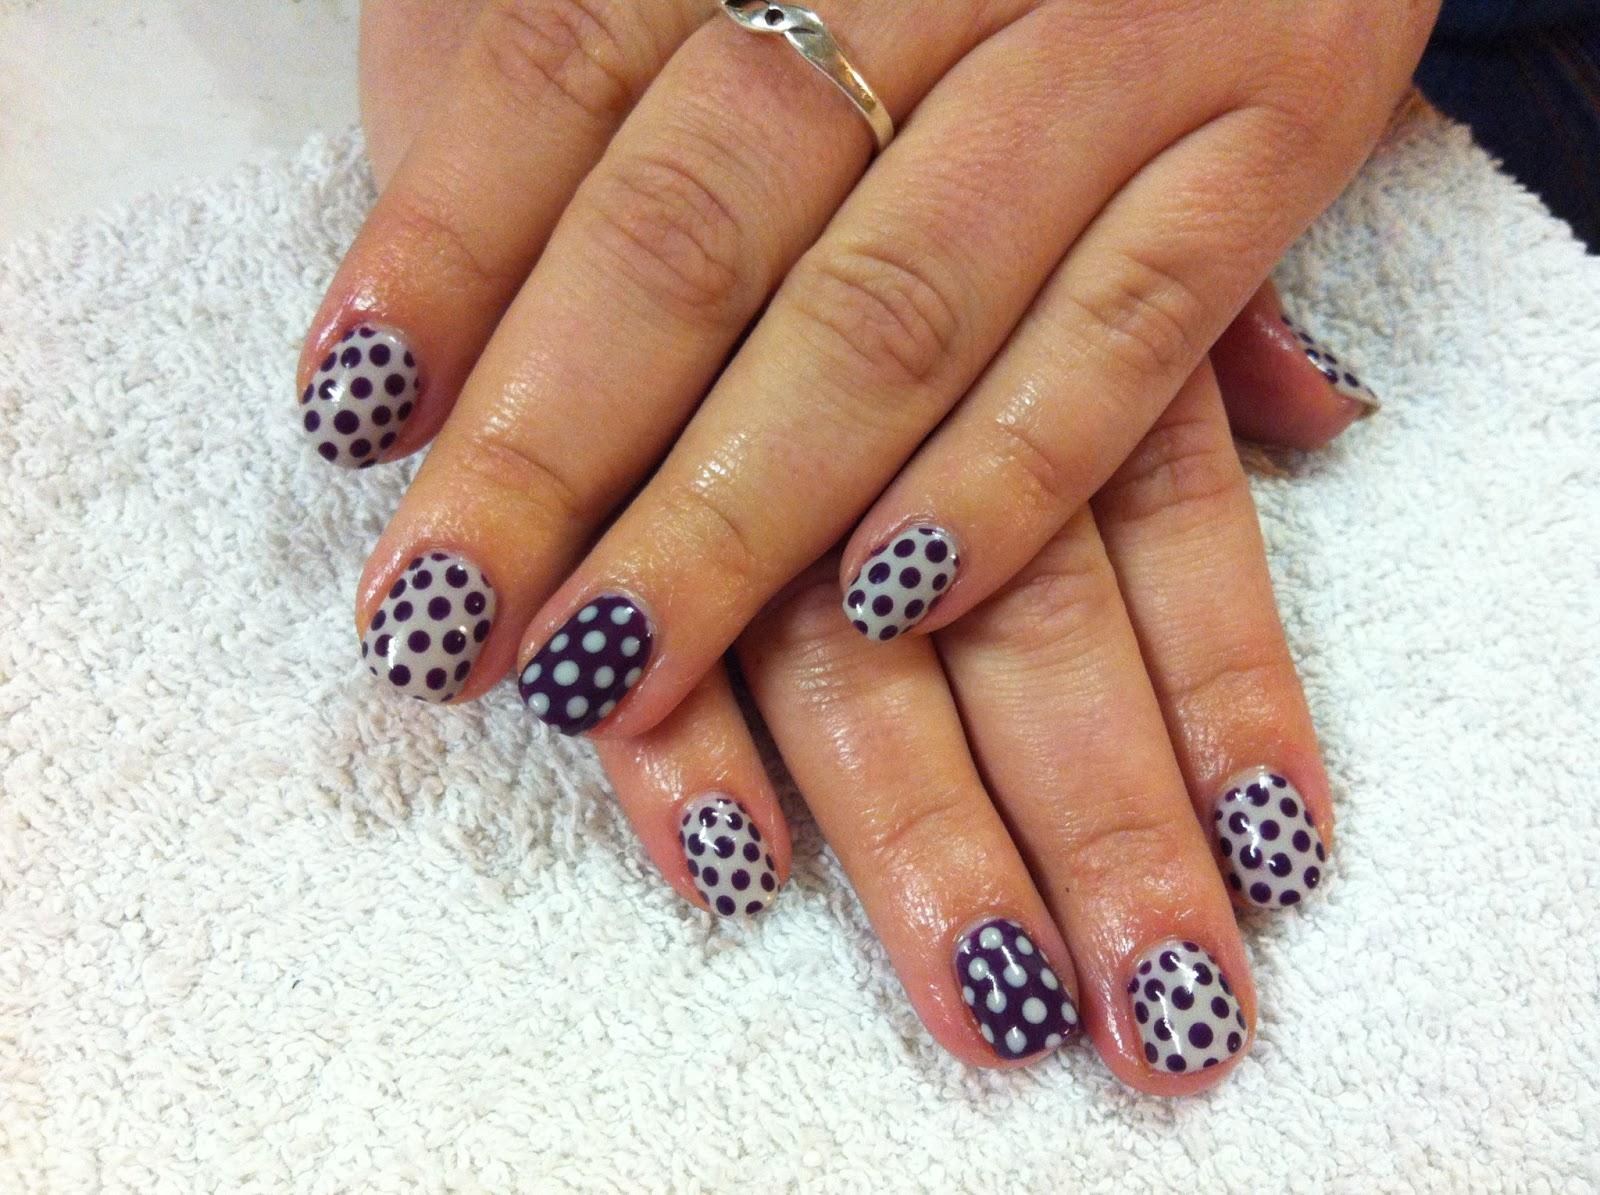 Brush up and polish up cnd shellac nail art purple polka dot cnd shellac nail art purple polka dot prinsesfo Image collections